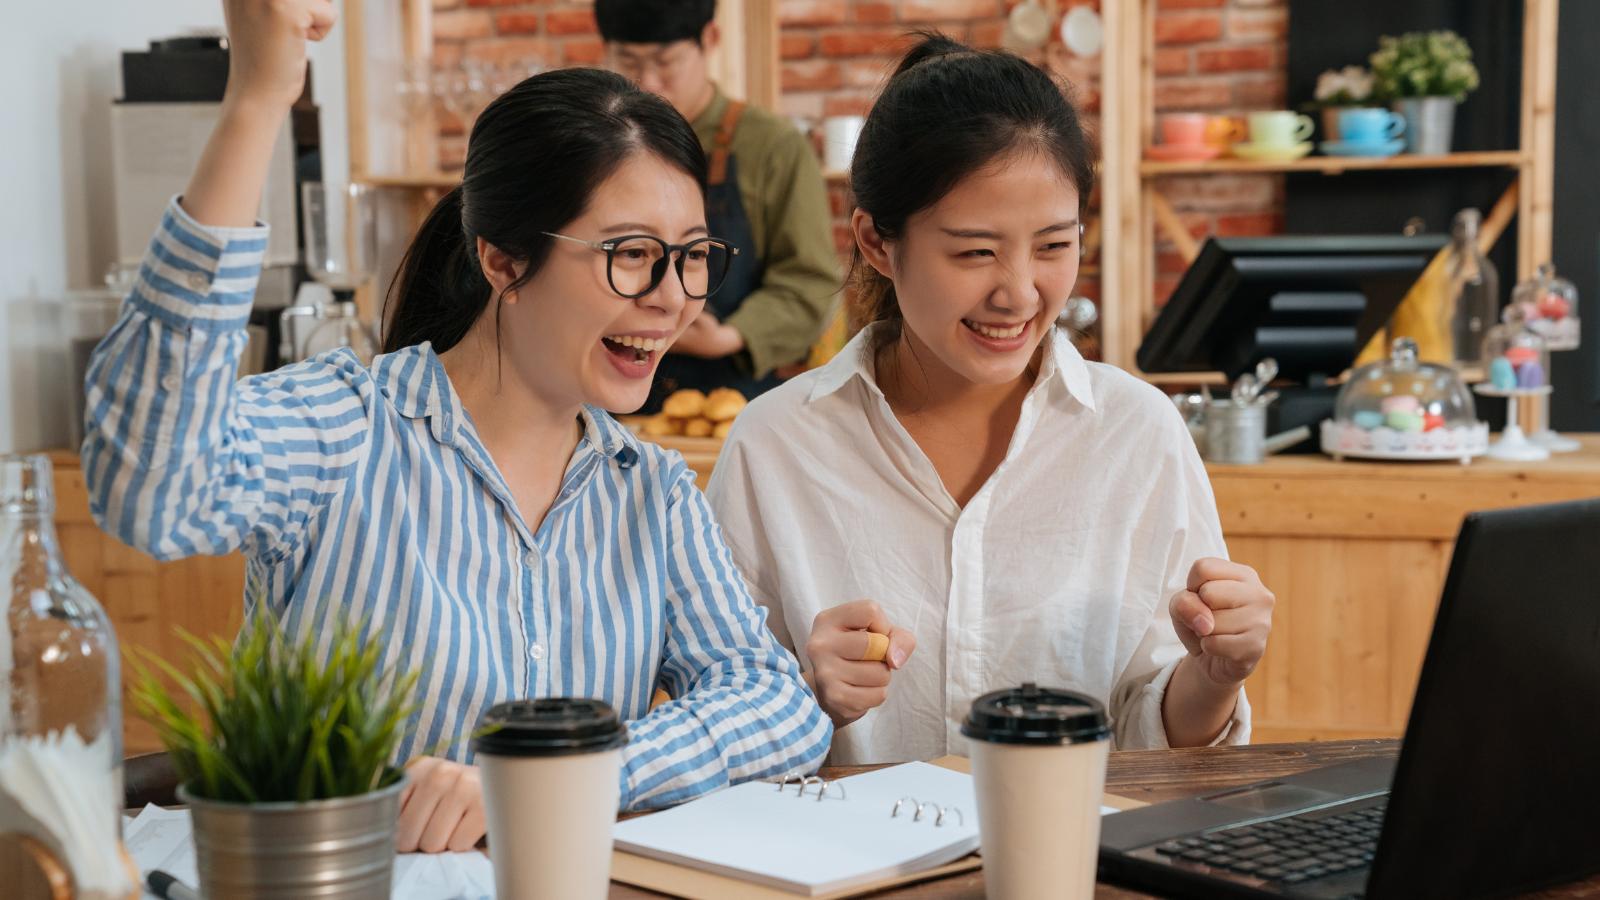 Value of mentoring women